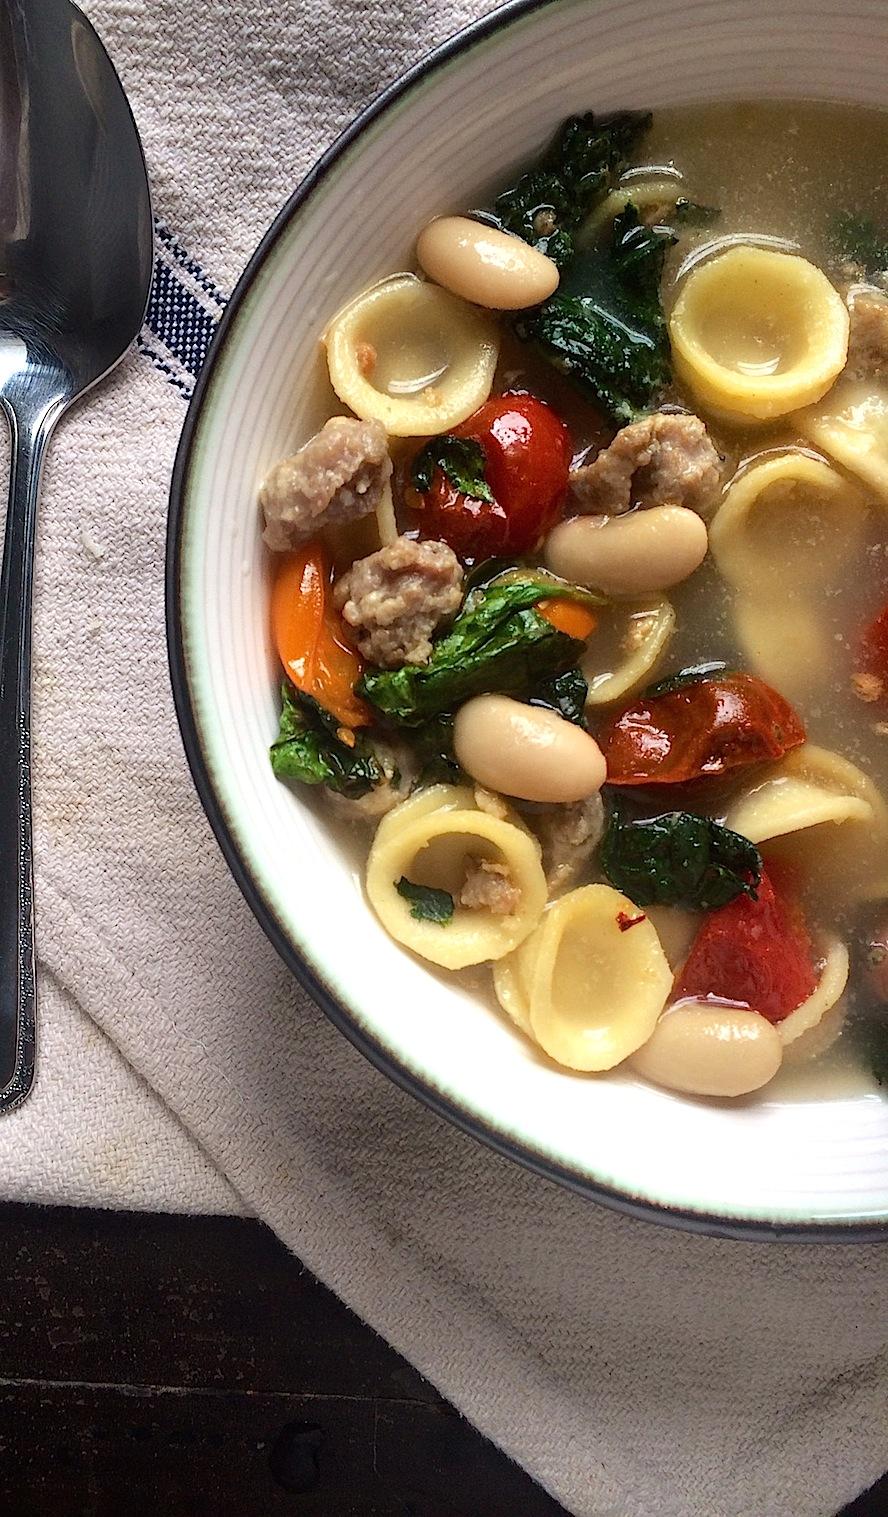 1 Dish, 2 Meals: Skillet Turkey Sausage with Rainbow Kale